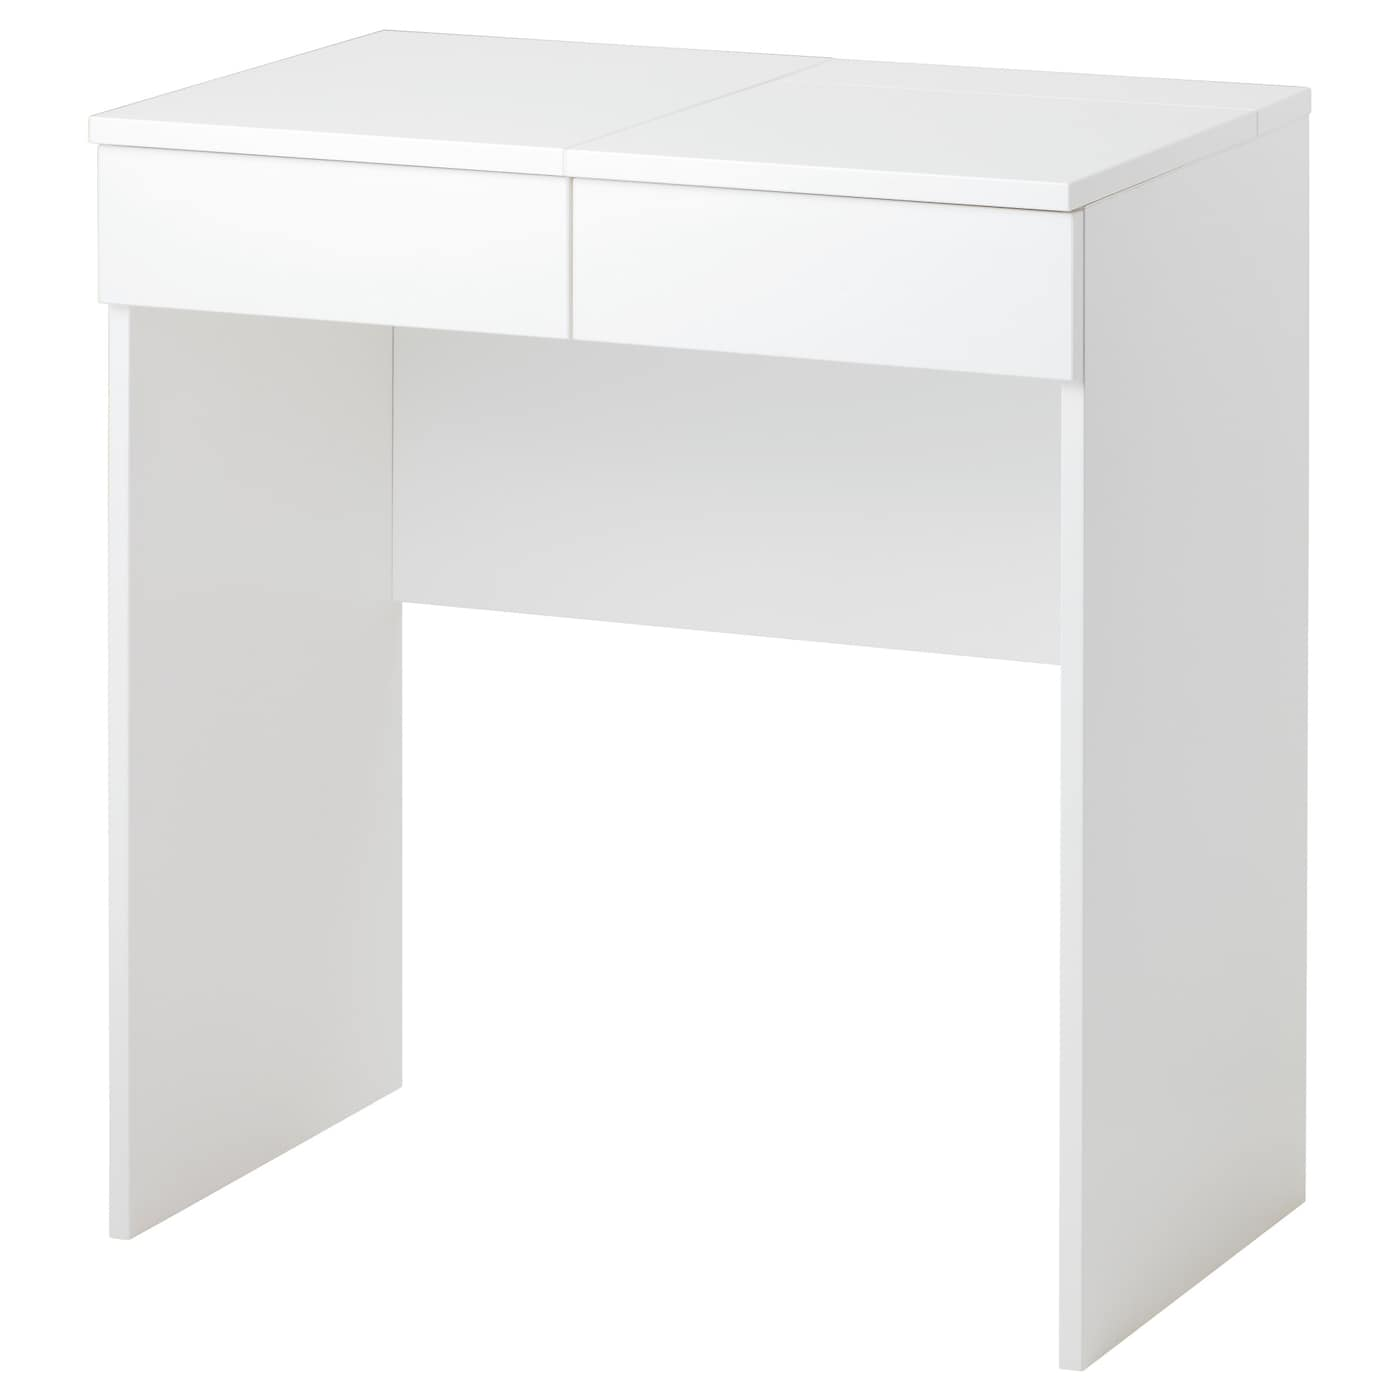 Brimnes Dressing Table White 70 X 42 Cm Ikea